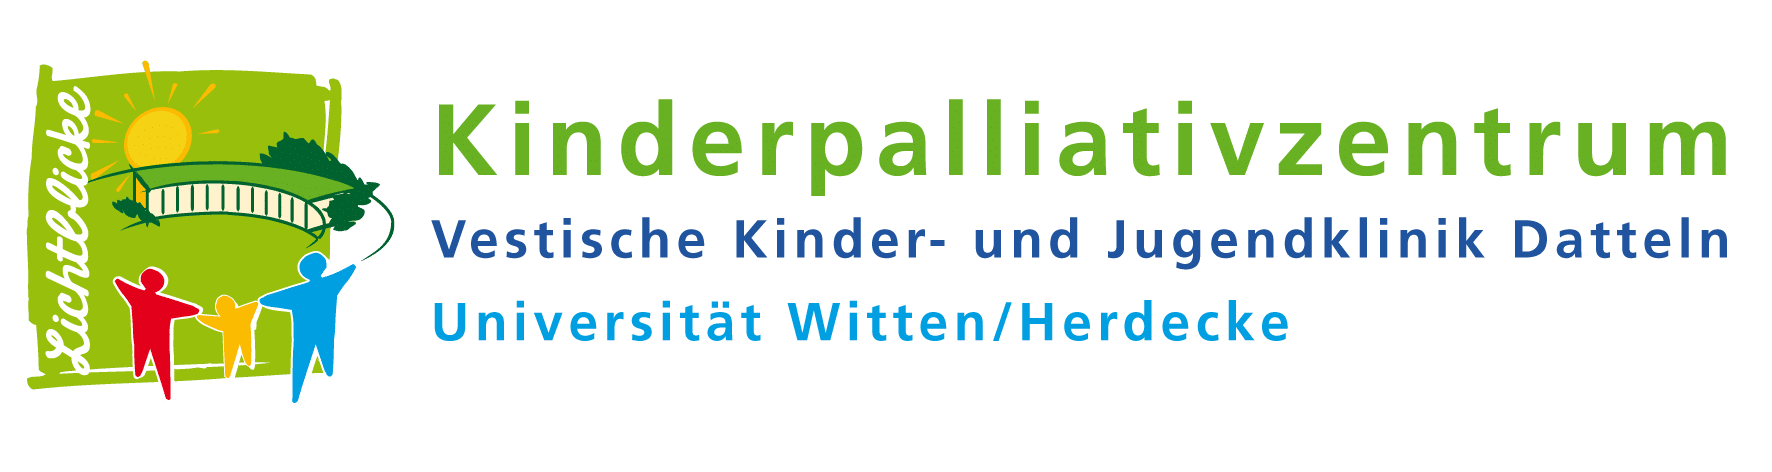 Kinderpalliativzentrum Datteln e.V.